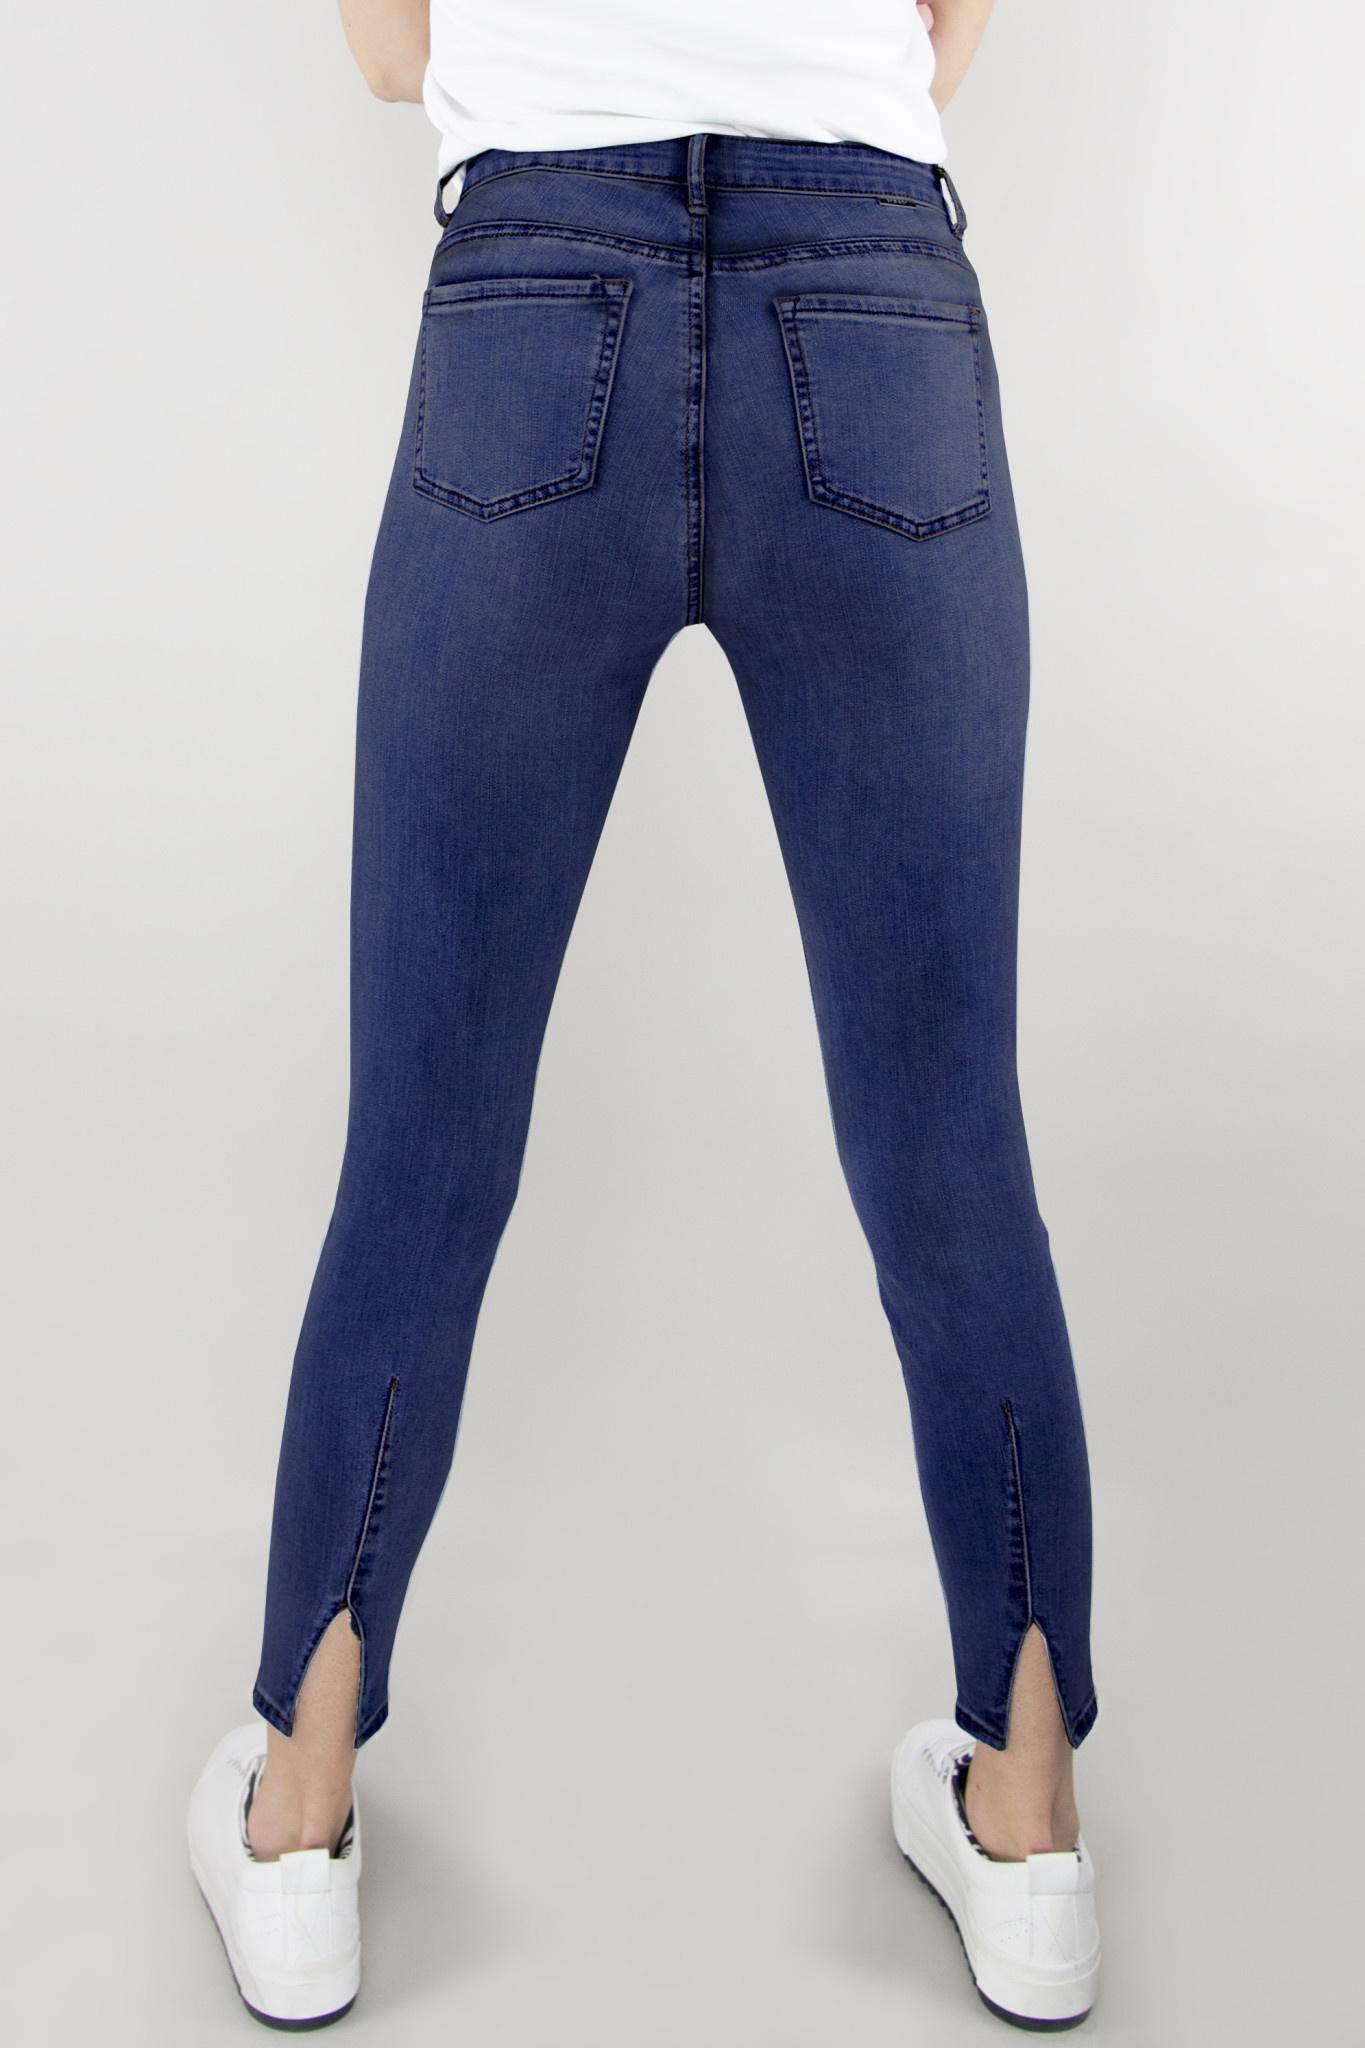 High Rise Back Slit Hem Skinny Jeans